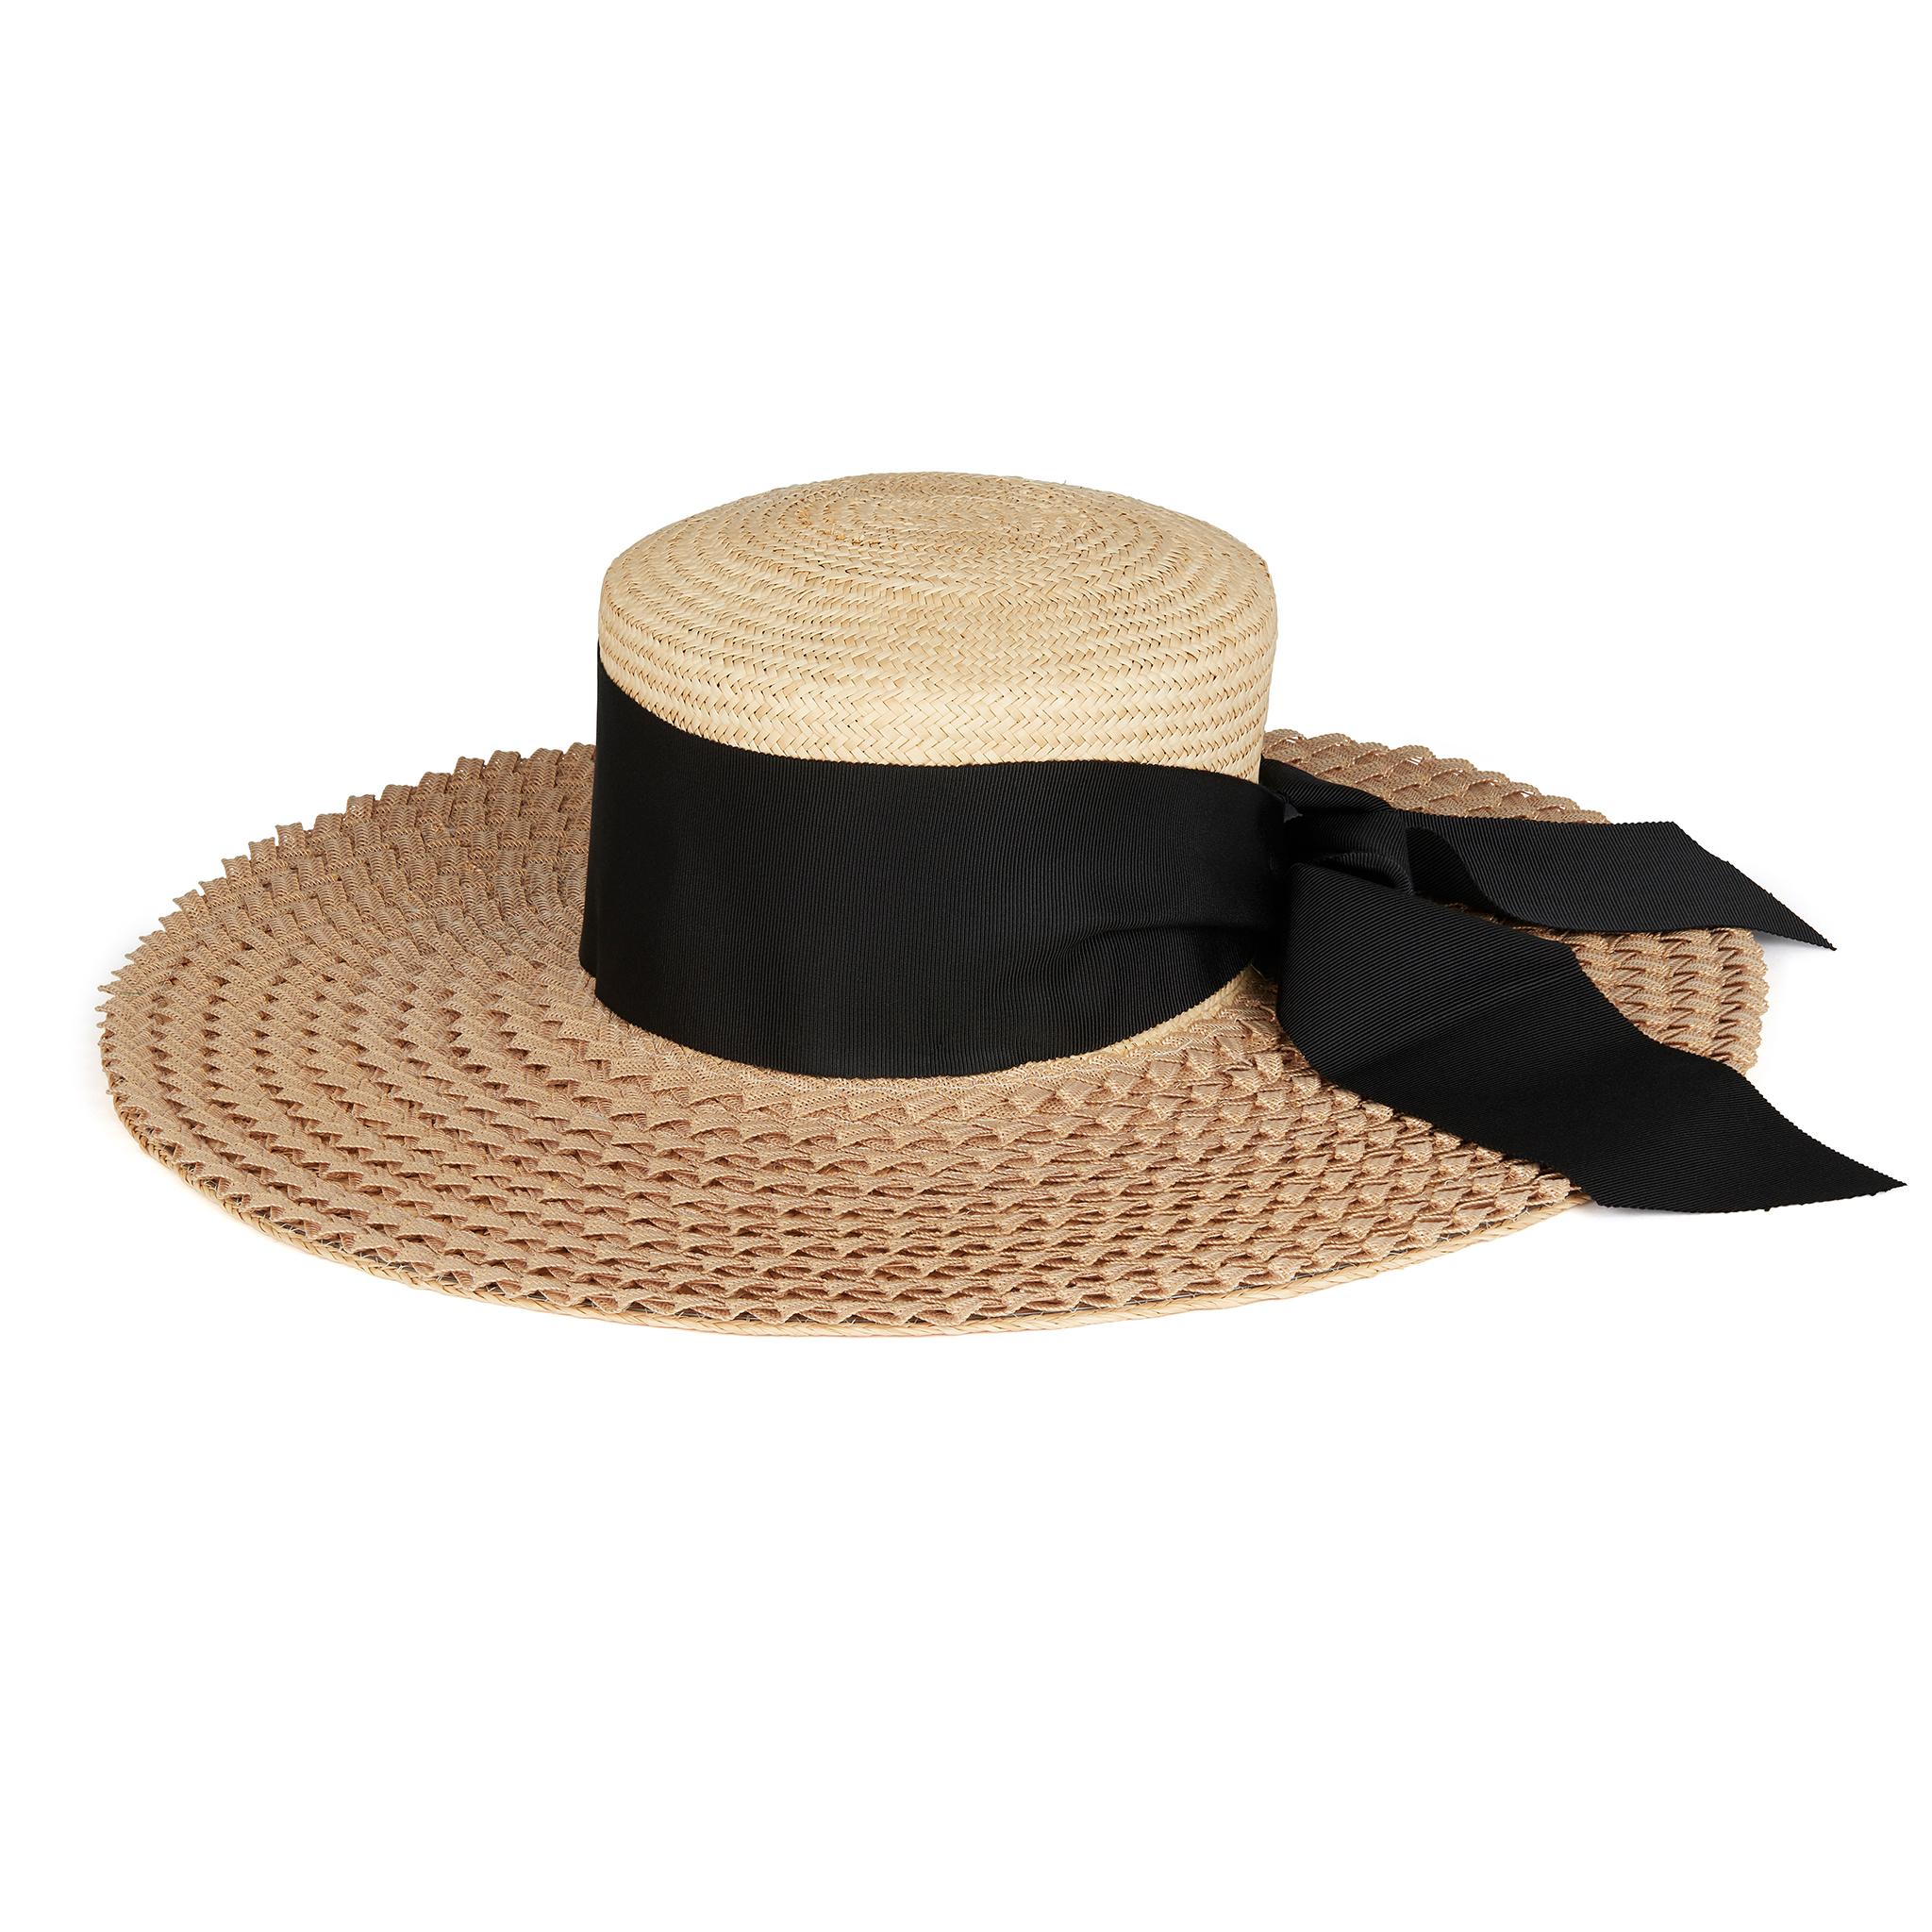 LRP-SM-Benoit-hats_03.jpg